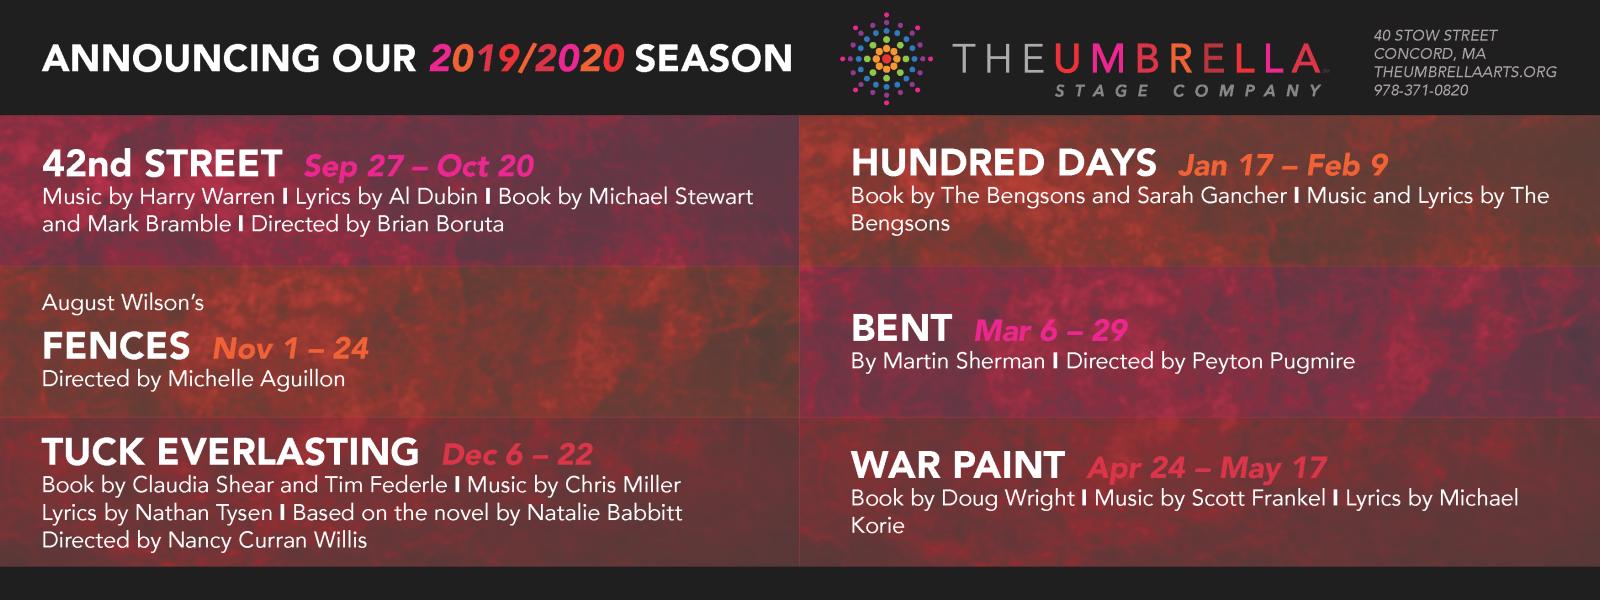 Stage Company Season 12 - 2019/2020